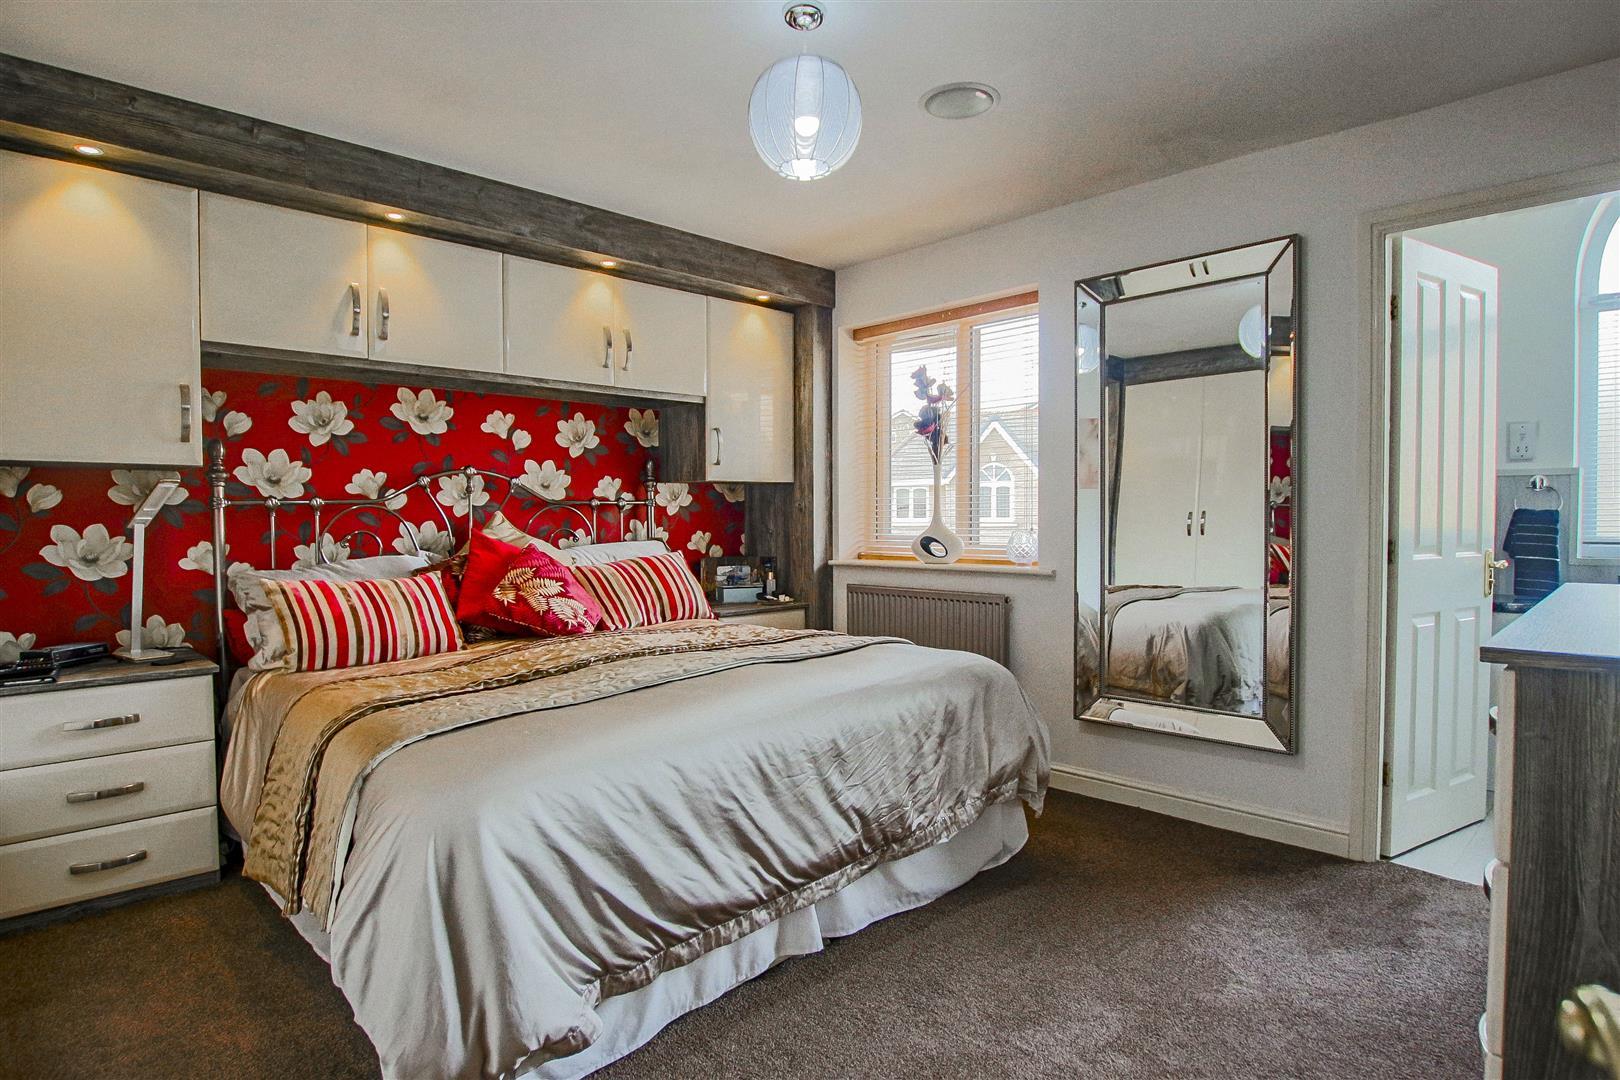 4 Bedroom Detached House For Sale - redwing31768.JPG